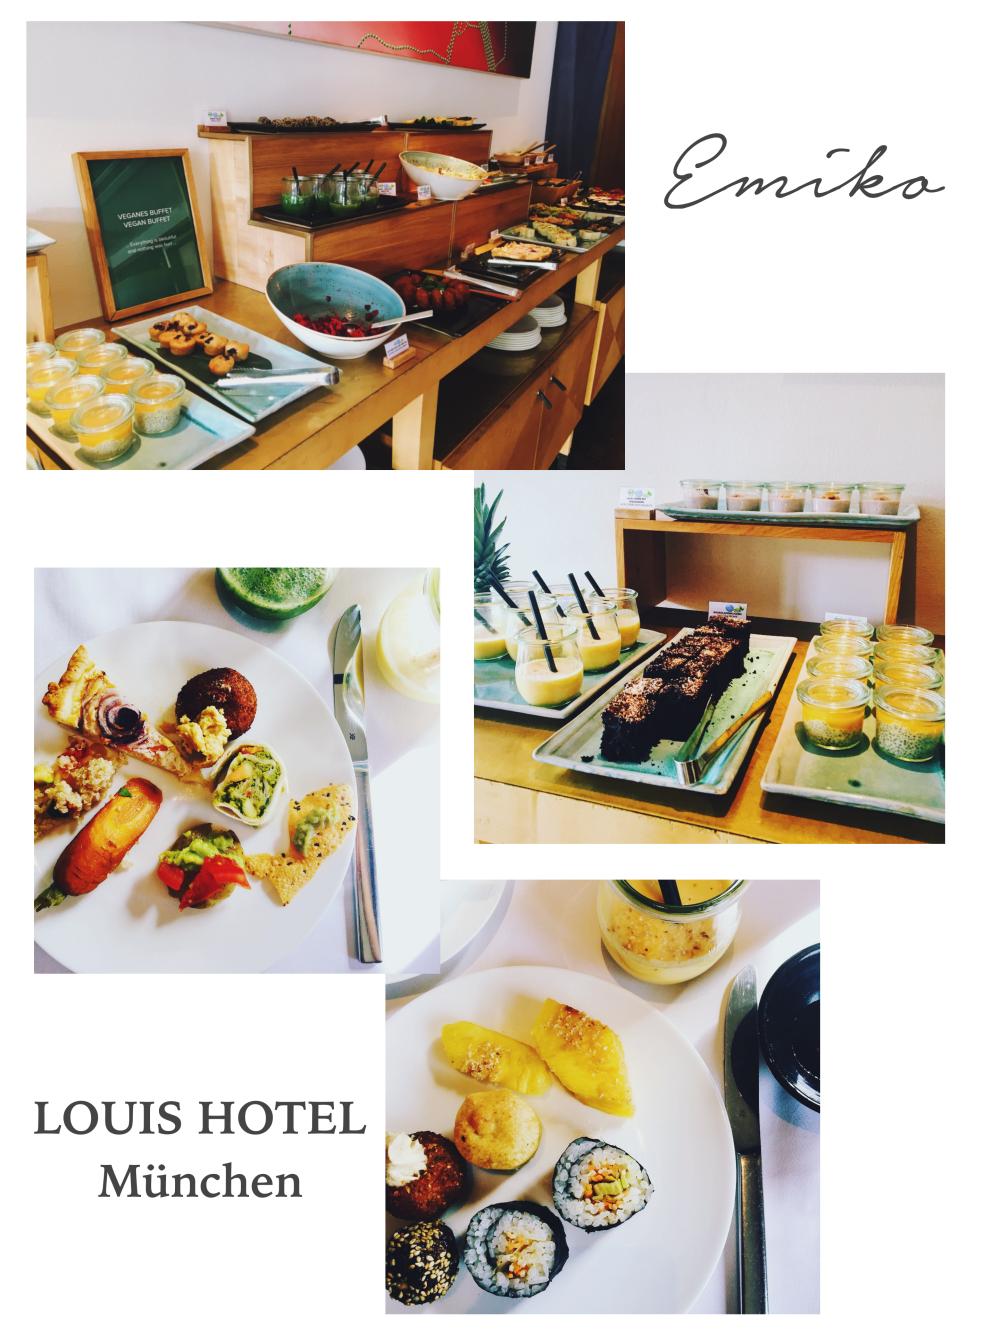 Vegan Guide München Emiko Hotel Louis